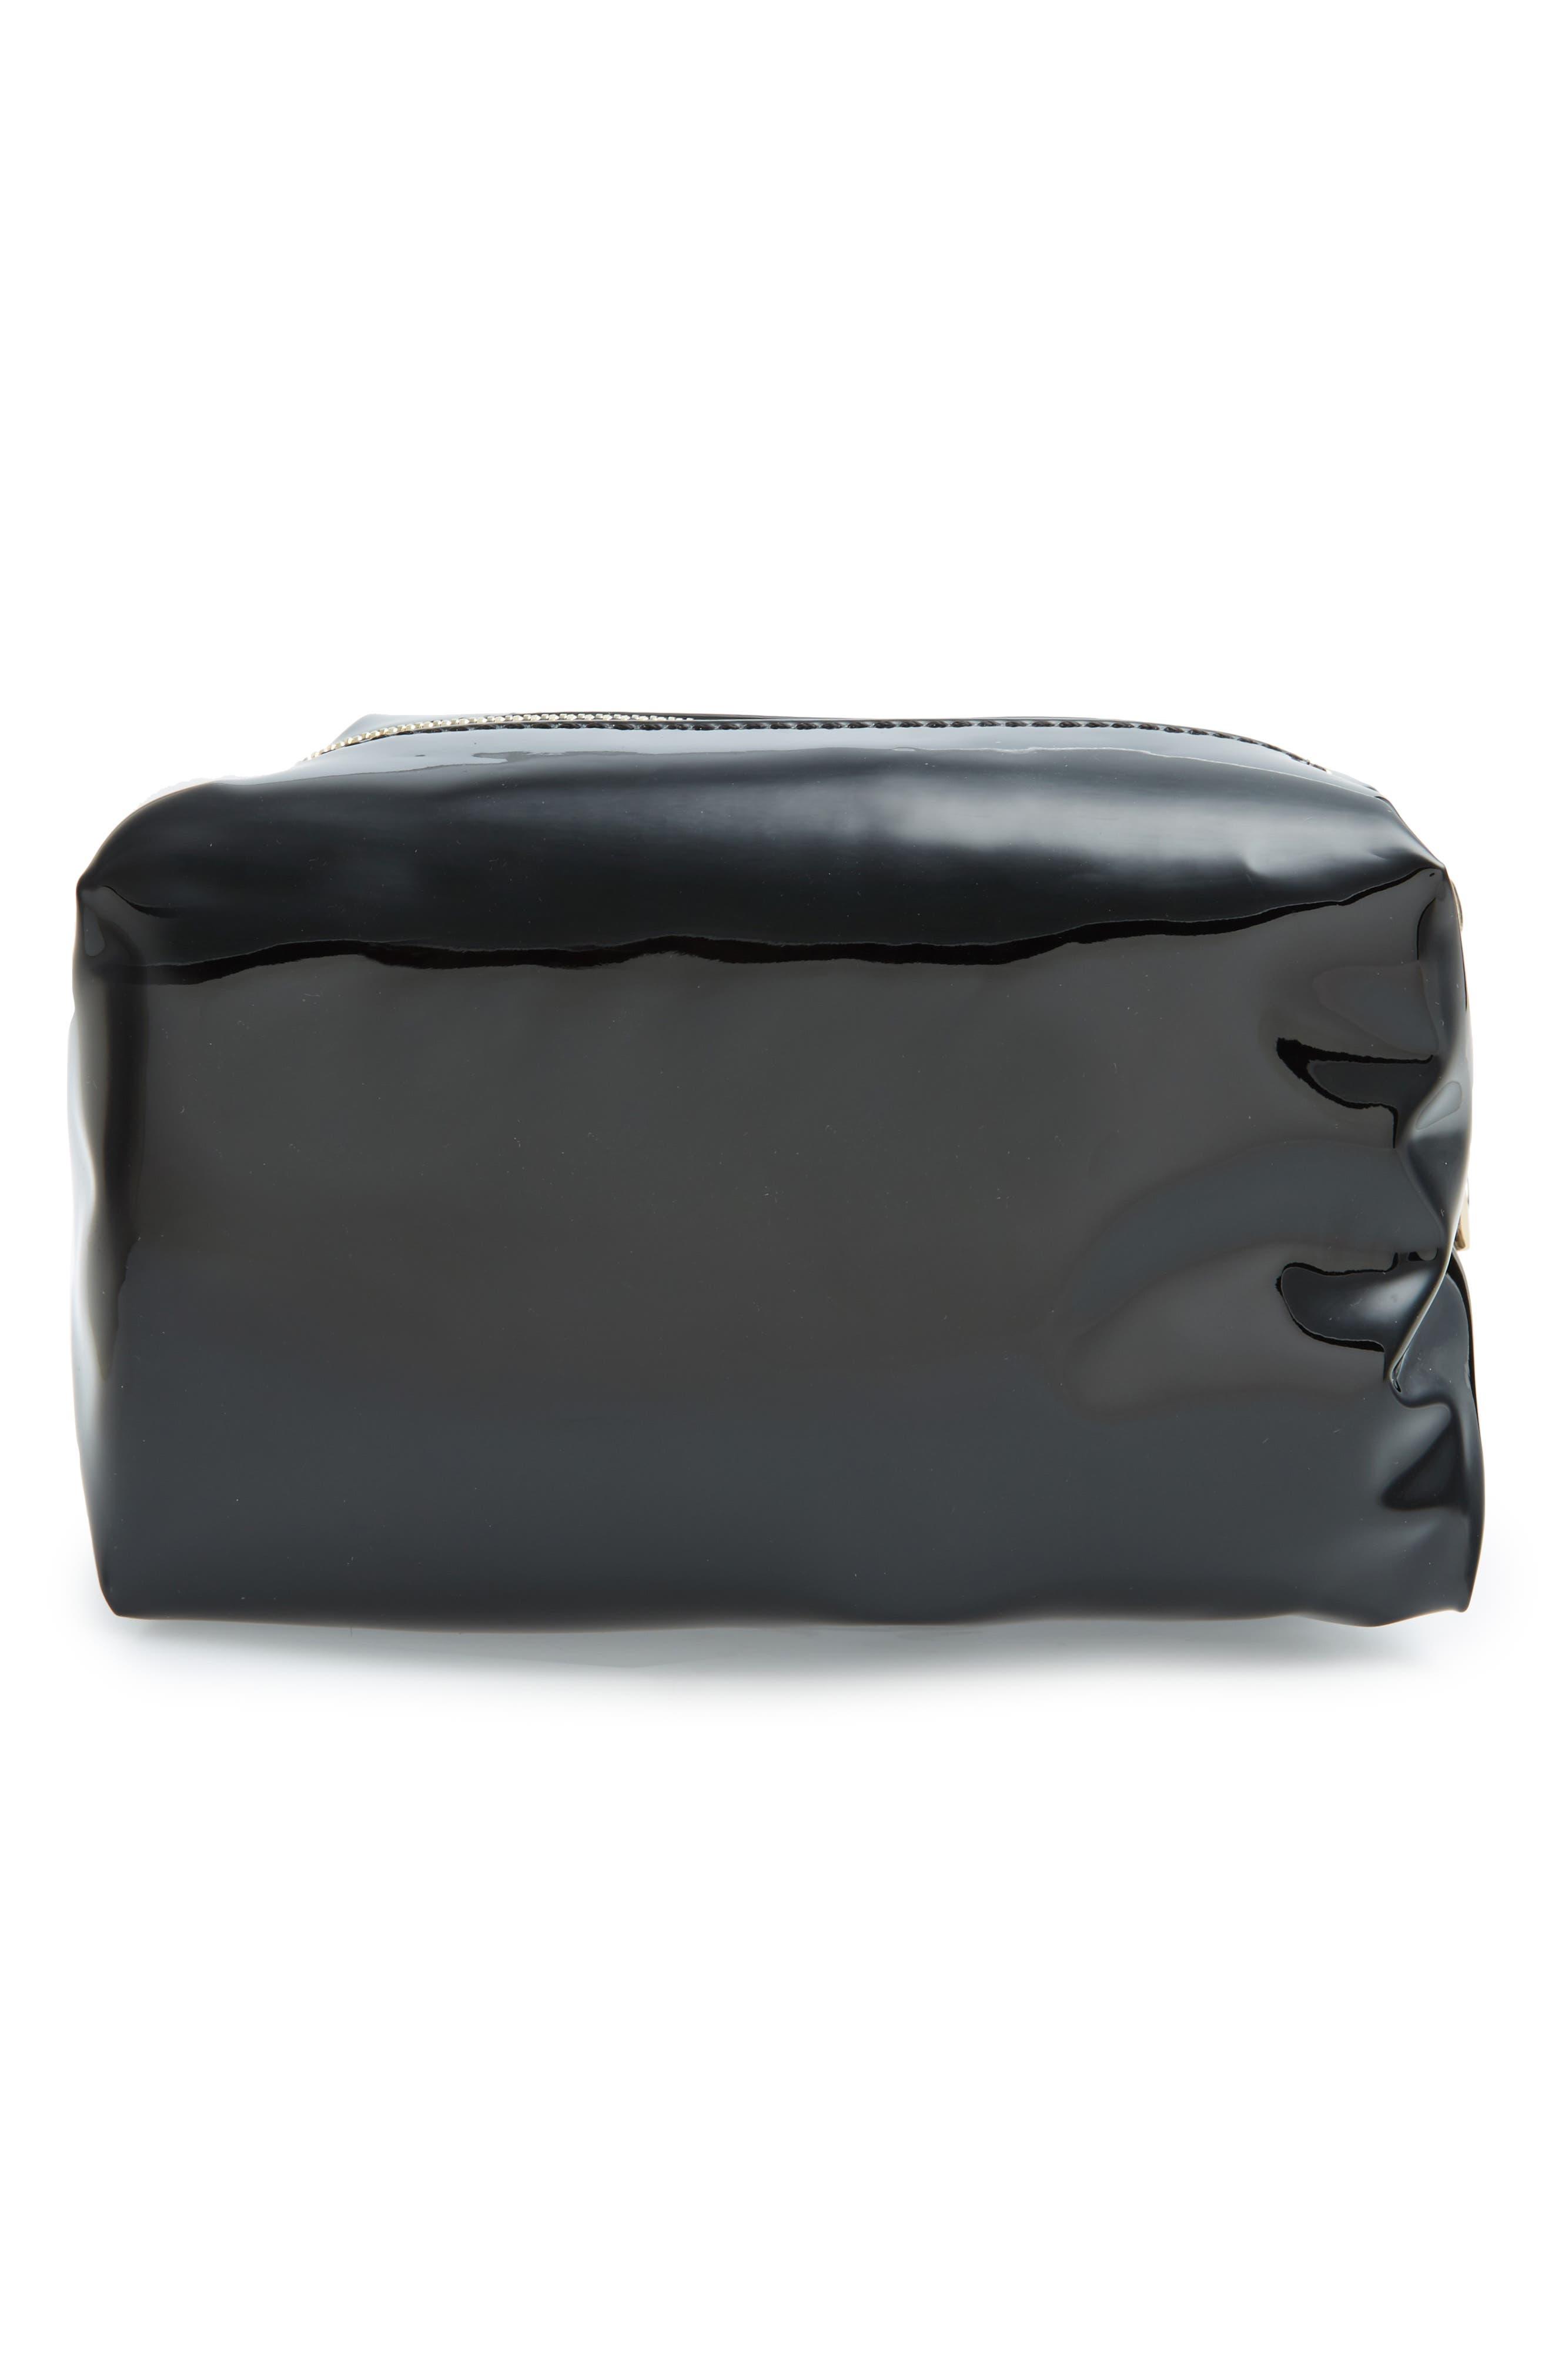 Metallic Cosmetics Bag,                             Alternate thumbnail 2, color,                             001